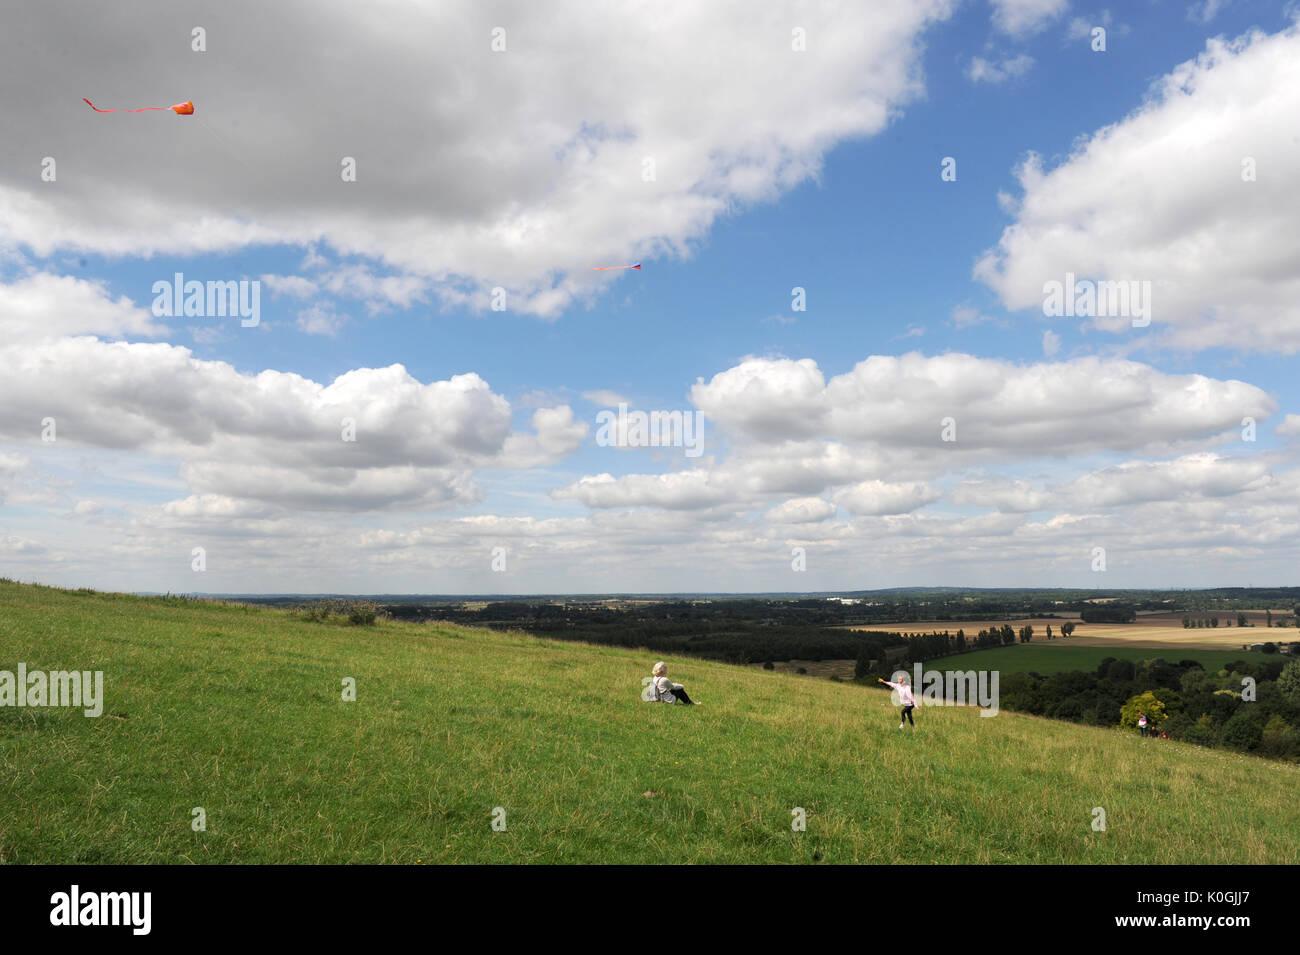 Children flying kites on Wittenham Clumps, Berkshire. U.K. - Stock Image